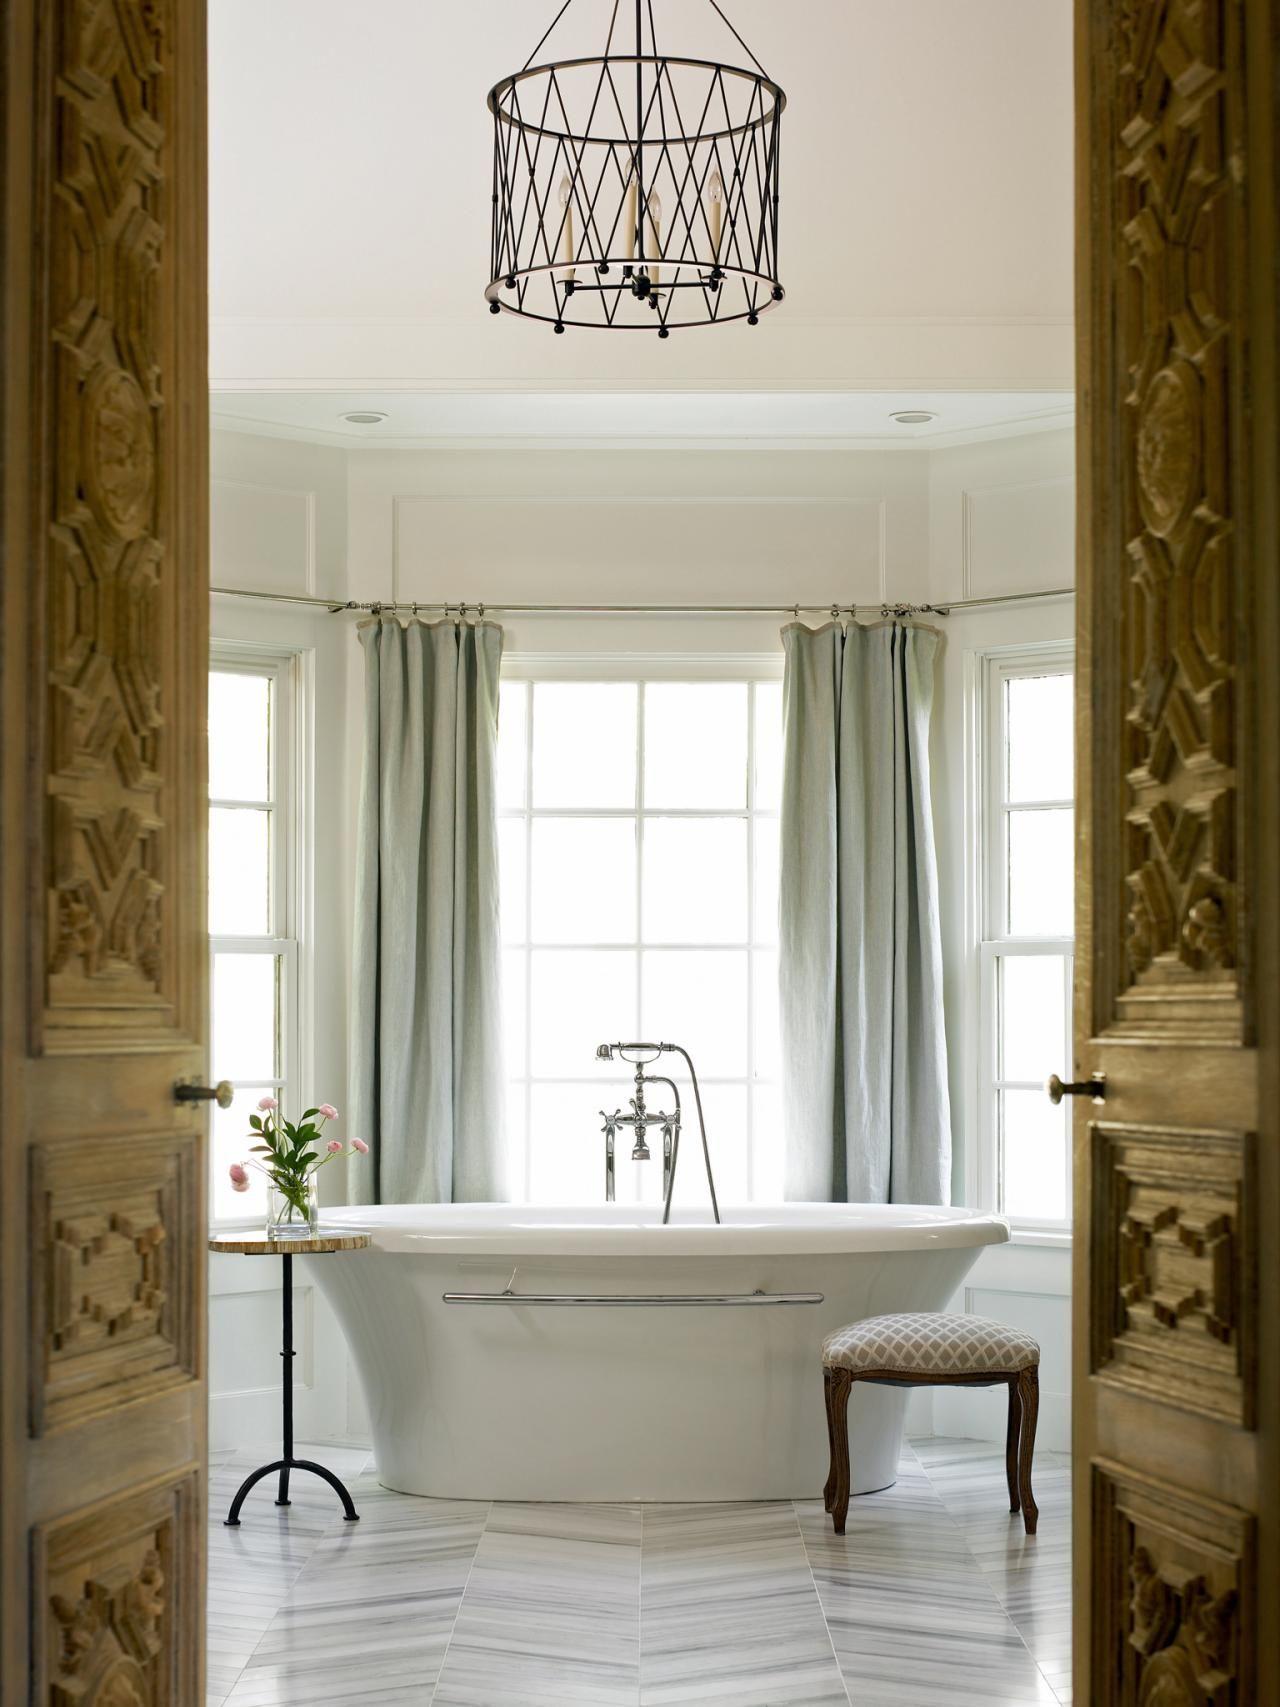 15 Dreamy Spa-Inspired Bathrooms | Pinterest | Large baths ...